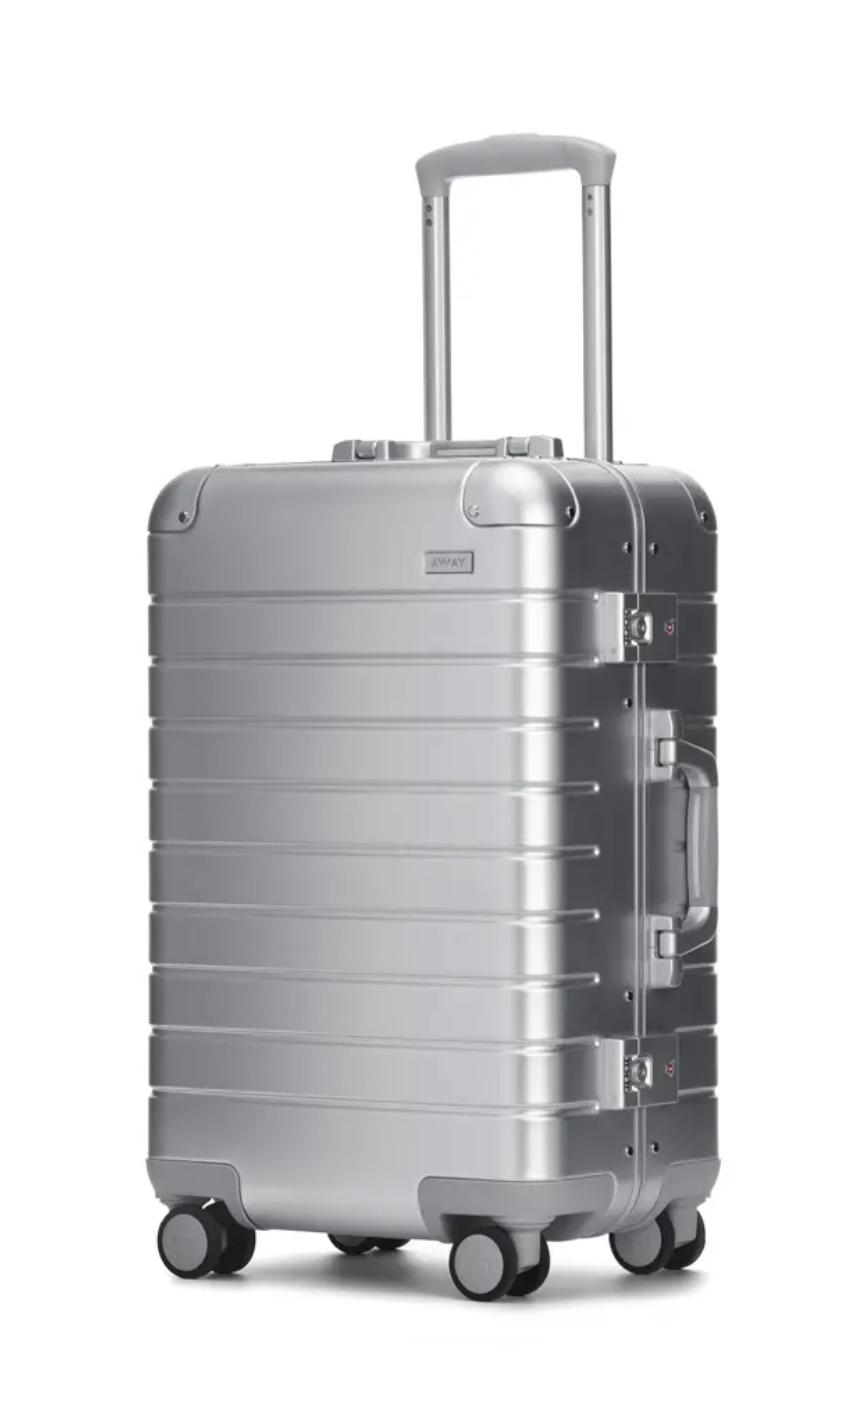 Away Bigger Carryon Suitcase